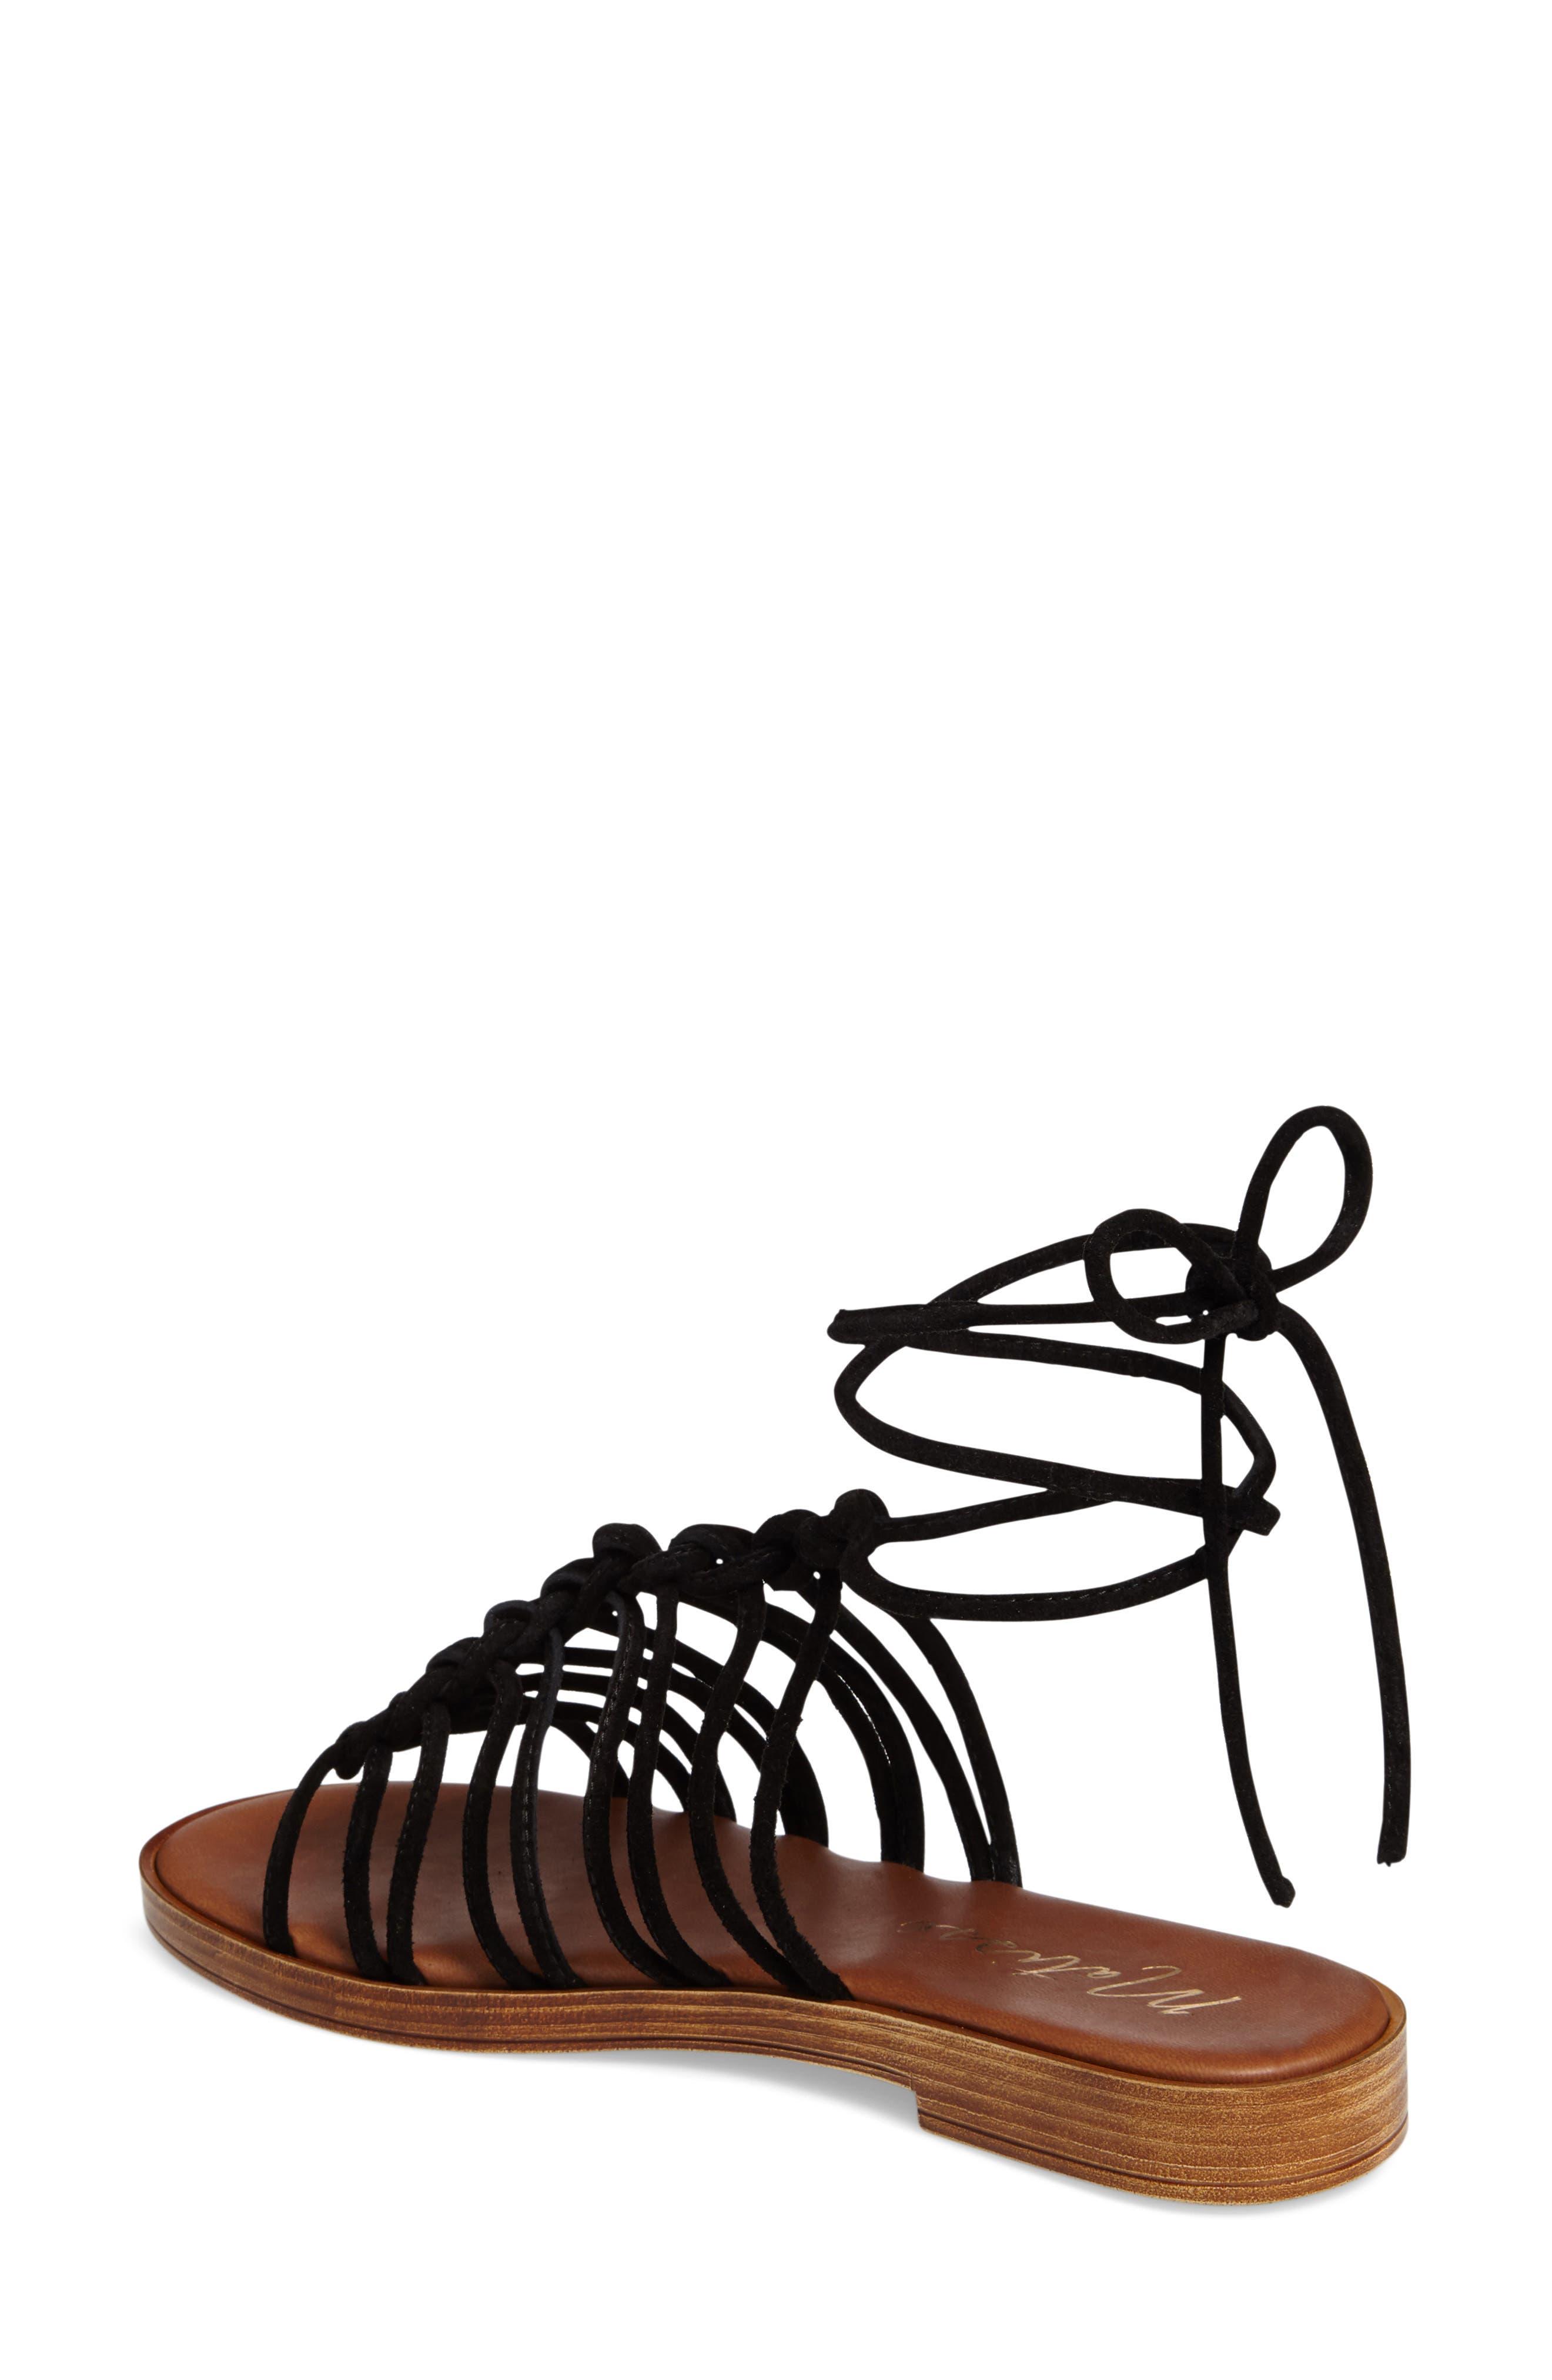 Origin Lace-Up Sandal,                             Alternate thumbnail 2, color,                             017